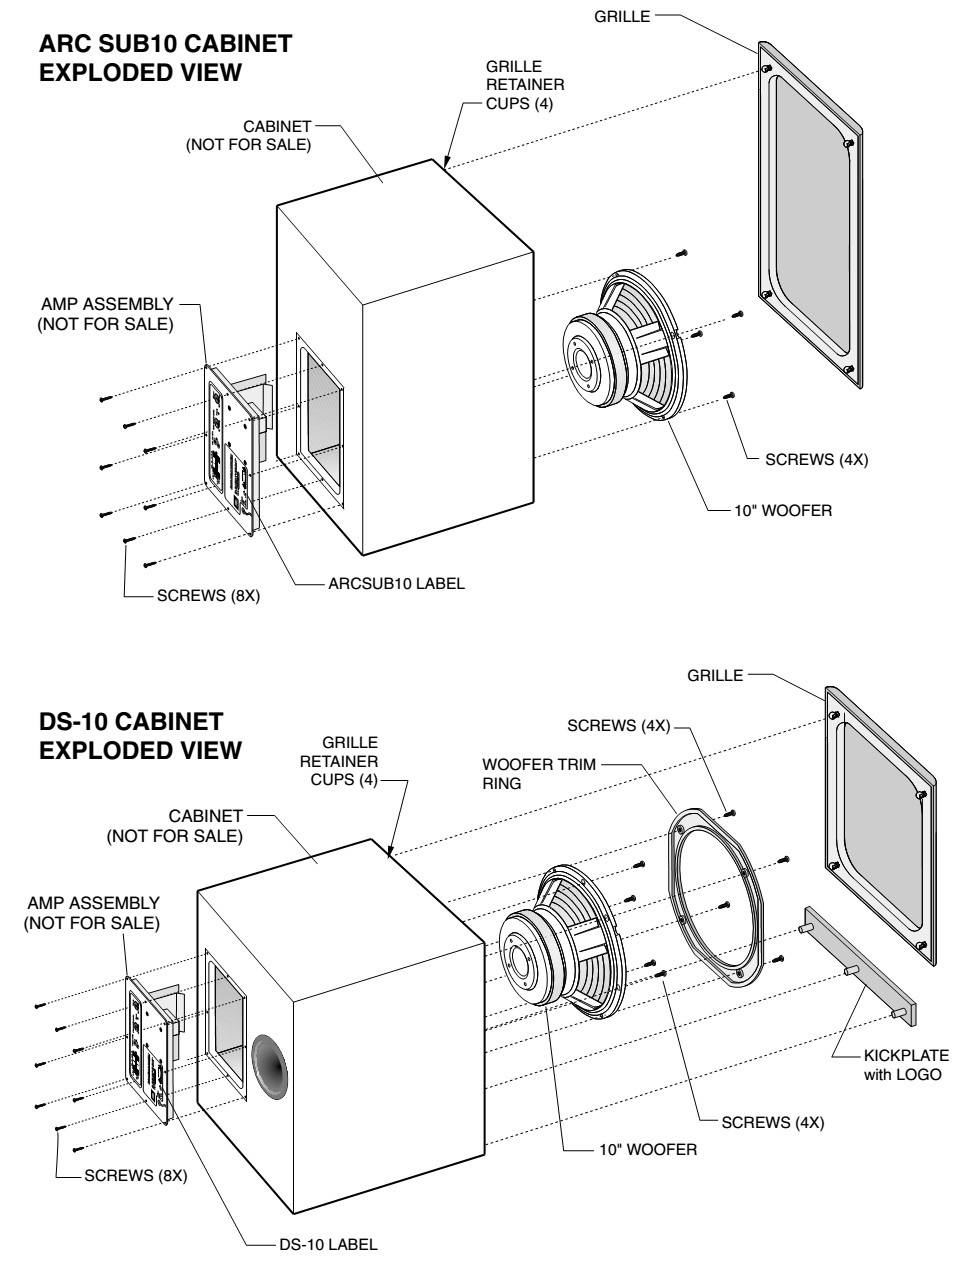 Jbl Subwoofer Wiring Diagram : Wiring diagram circuit jbl arc subwoofer power amp